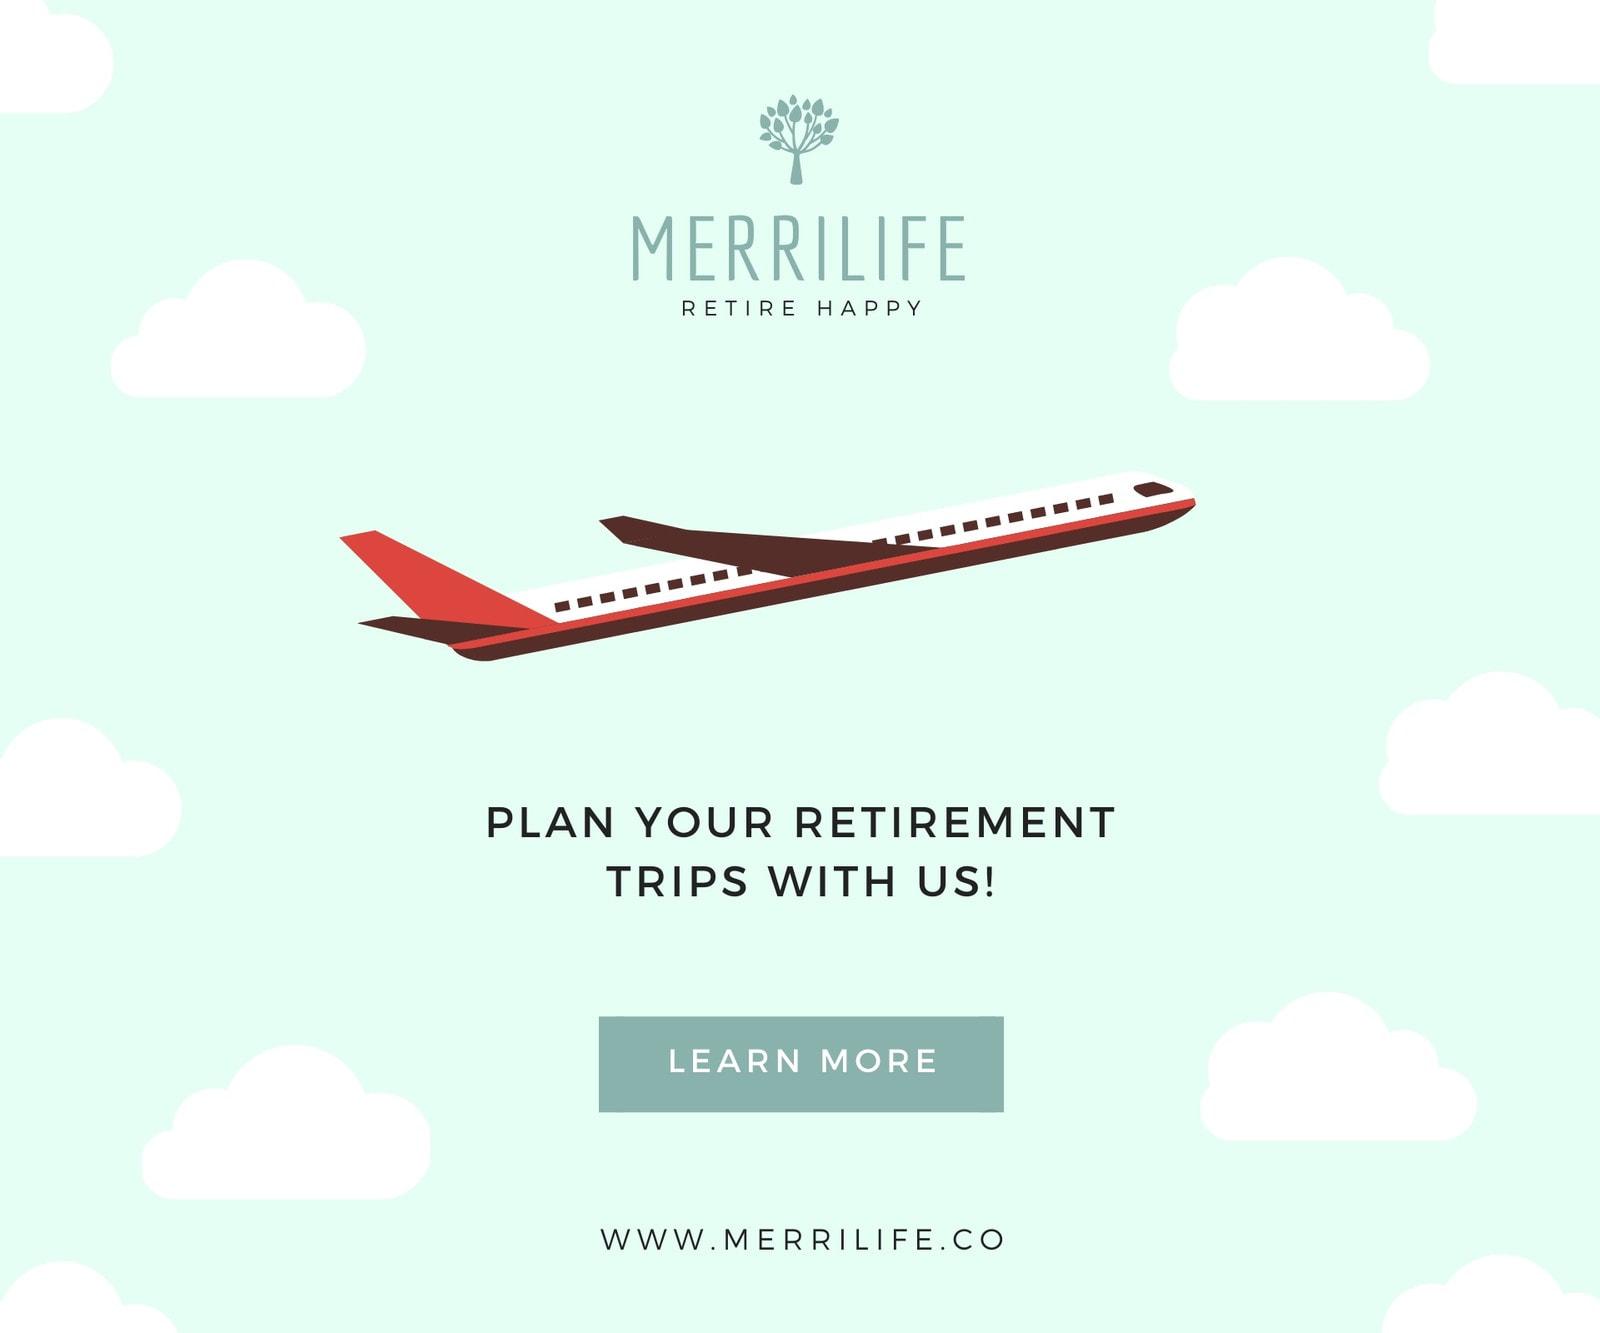 Airplane Retirement Medium Rectangle Banner